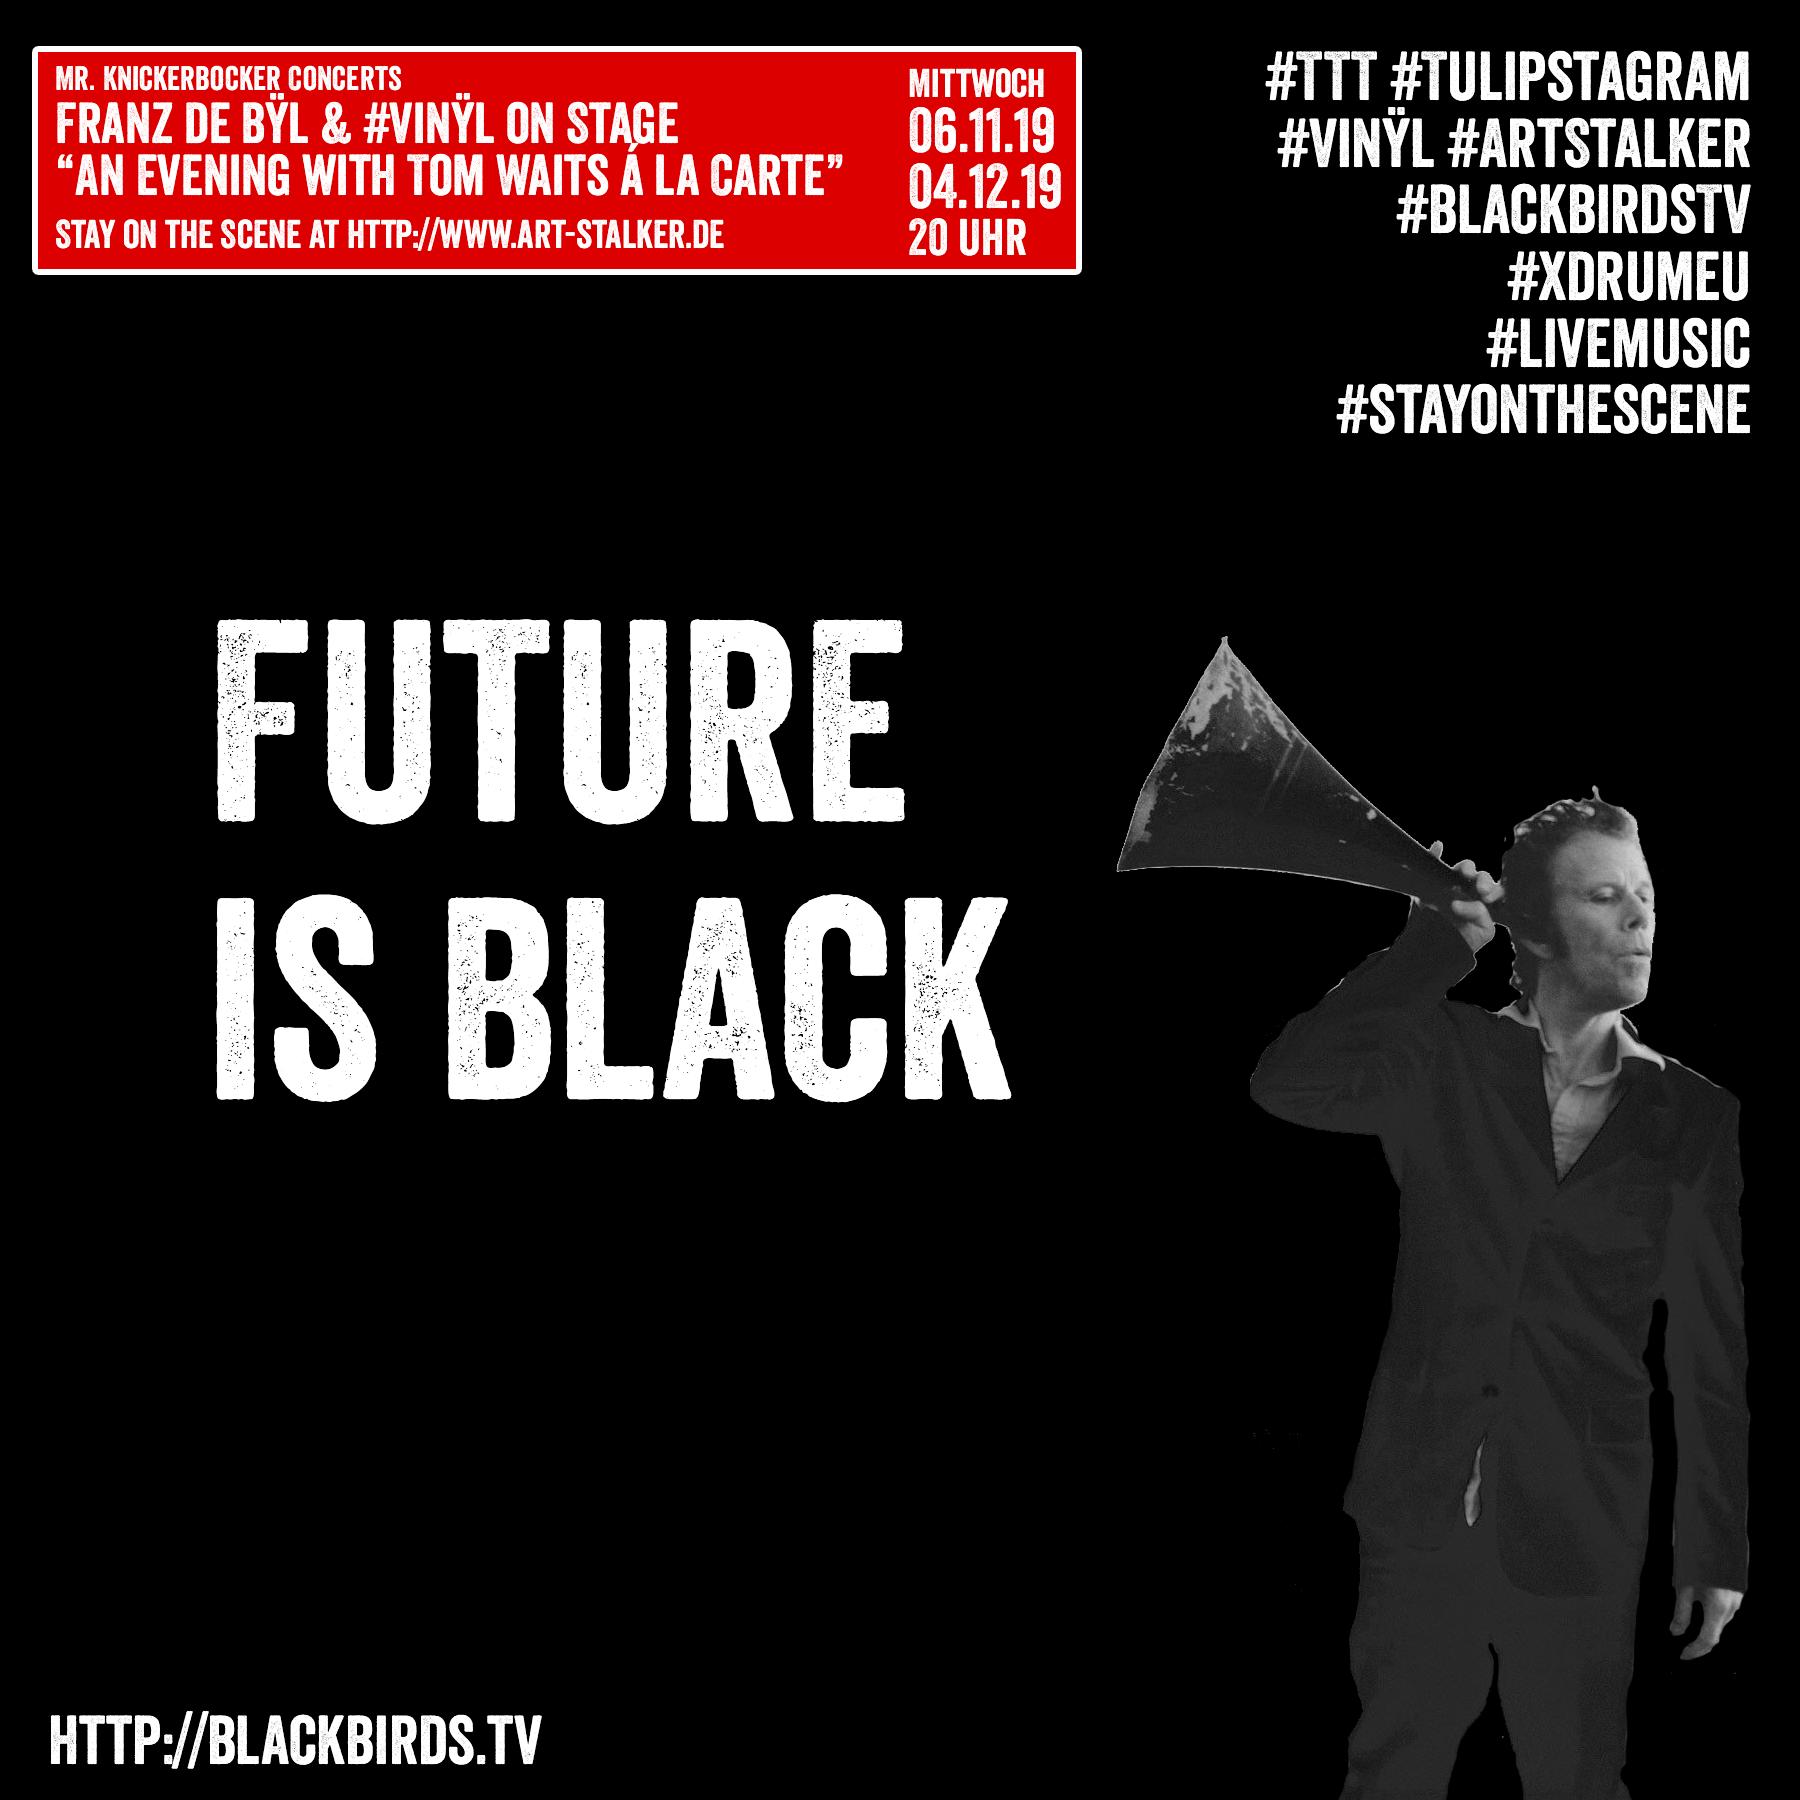 "Mr. Knickerbocker Concerts: Franz de Bÿl & #Vinÿl on stage ""An Evening with Tom Taits á la carte"" Stay on the Scene at http://www.art-stalker.de/ Mittwoch, 06.11.19 Mittwoch, 04.12.19 20 Uhr (19:30 Uhr doors open) #TTT #Tulipstagram #Vinÿl #ArtStalker #blackbirdsTV #xdrumEU #Livemusic #StayontheScene – hier: ART Stalker."